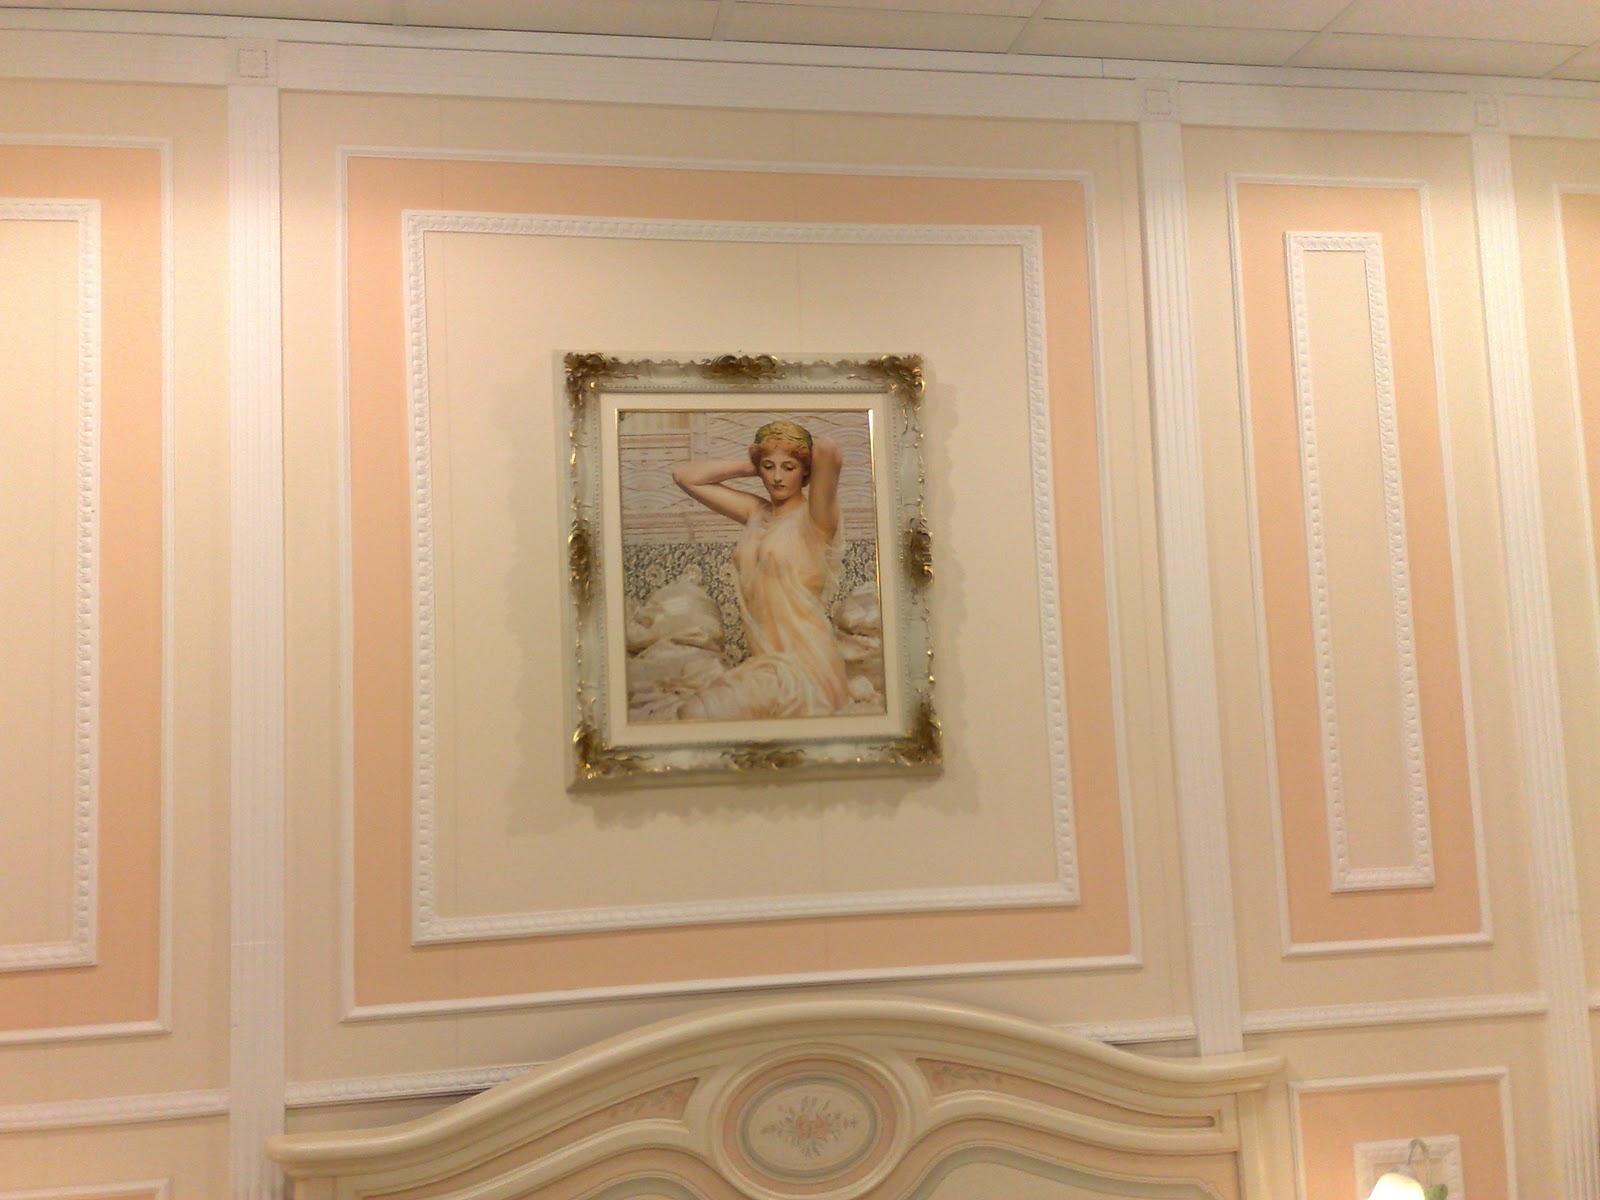 Cominodecori imbianchino da interni - Stucchi decorativi per pareti ...